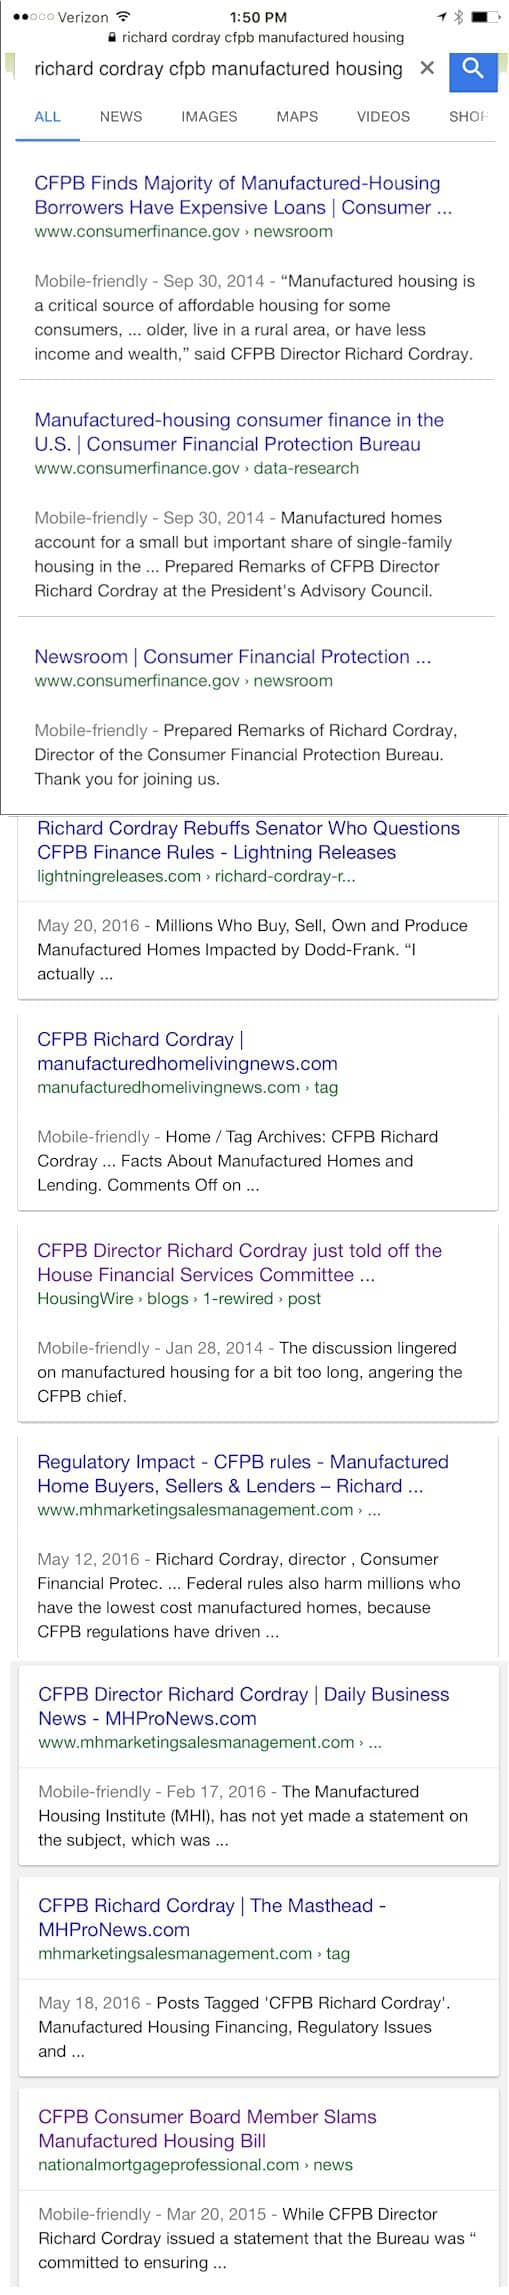 CFPBRichardCordrayManufacturedHomeLoanRegulations-postedMastheadBlog-MHProNews-